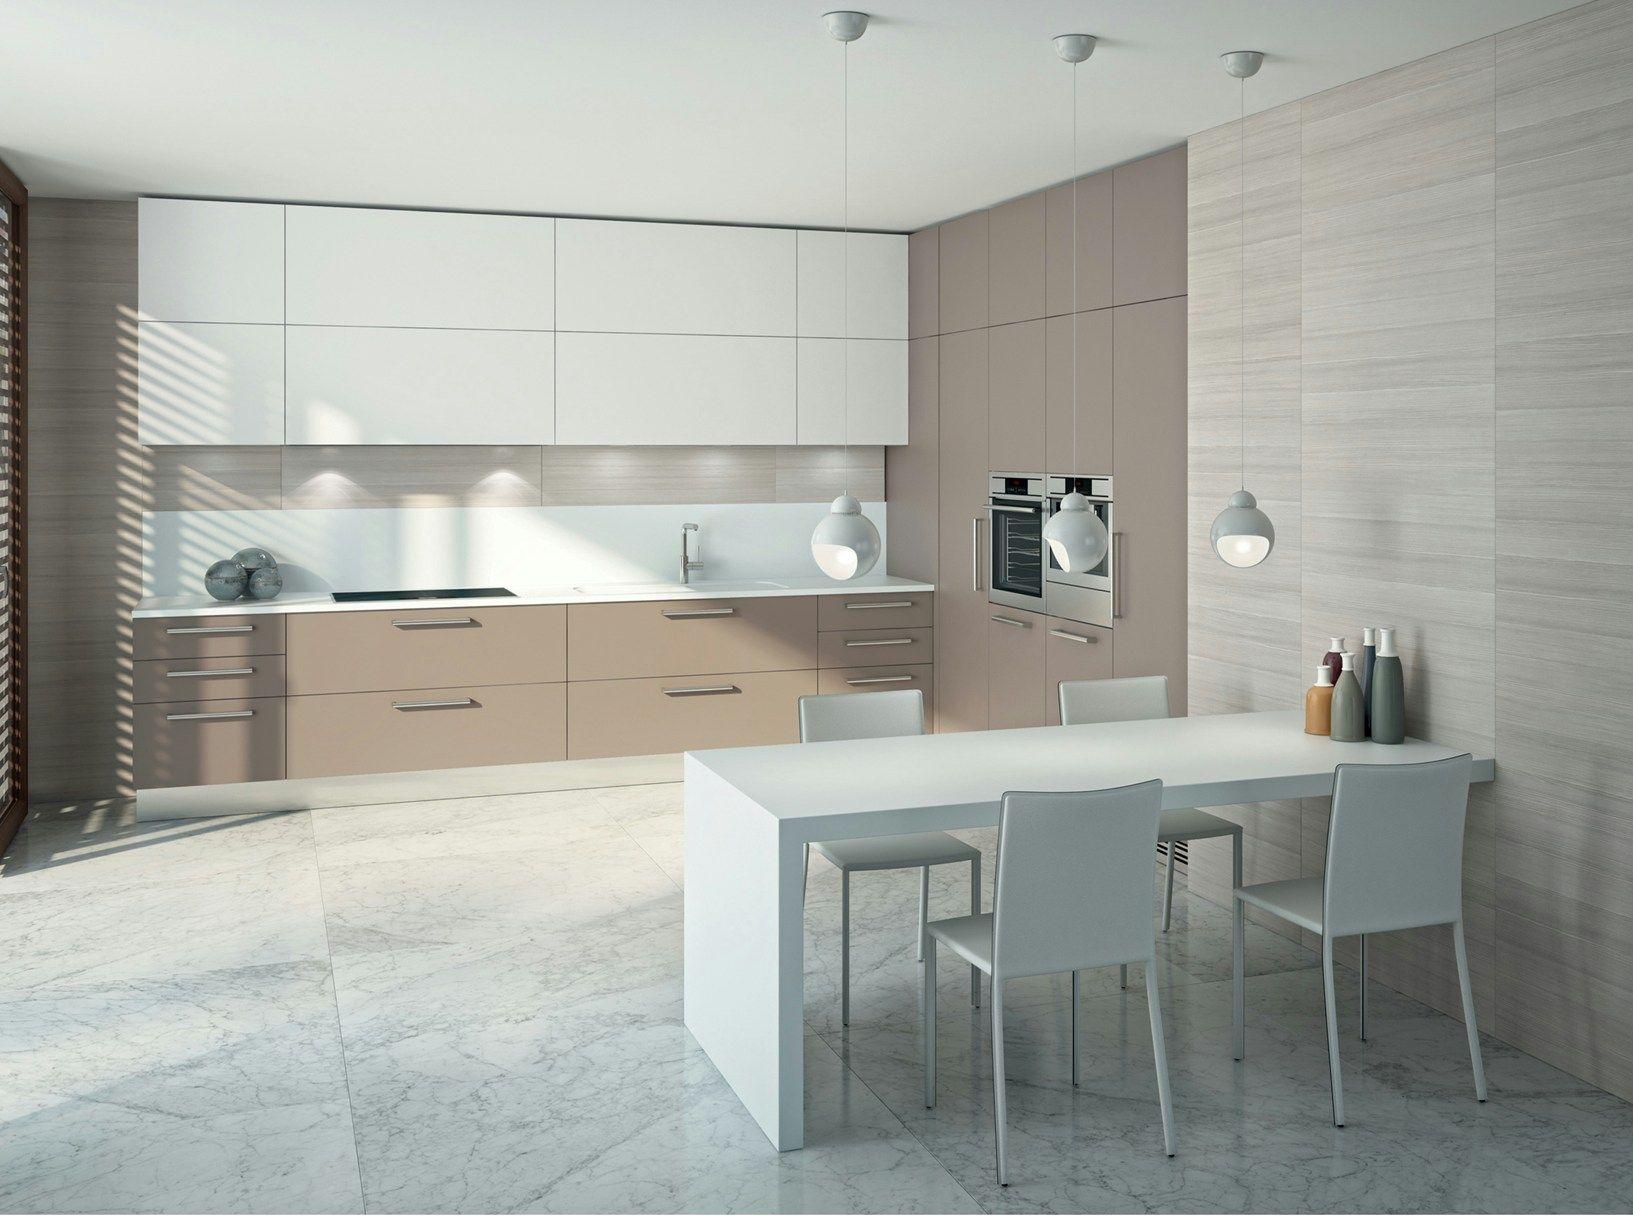 Nuovo Muebles Cocina - Inaugurato Il Nuovo Store Ernestomeda A Singapore Lo Spazio [mjhdah]https://cdn3.decoracion2.com/imagenes/2015/09/nuevo-catalogo-ikea-cocina-blanca.jpg